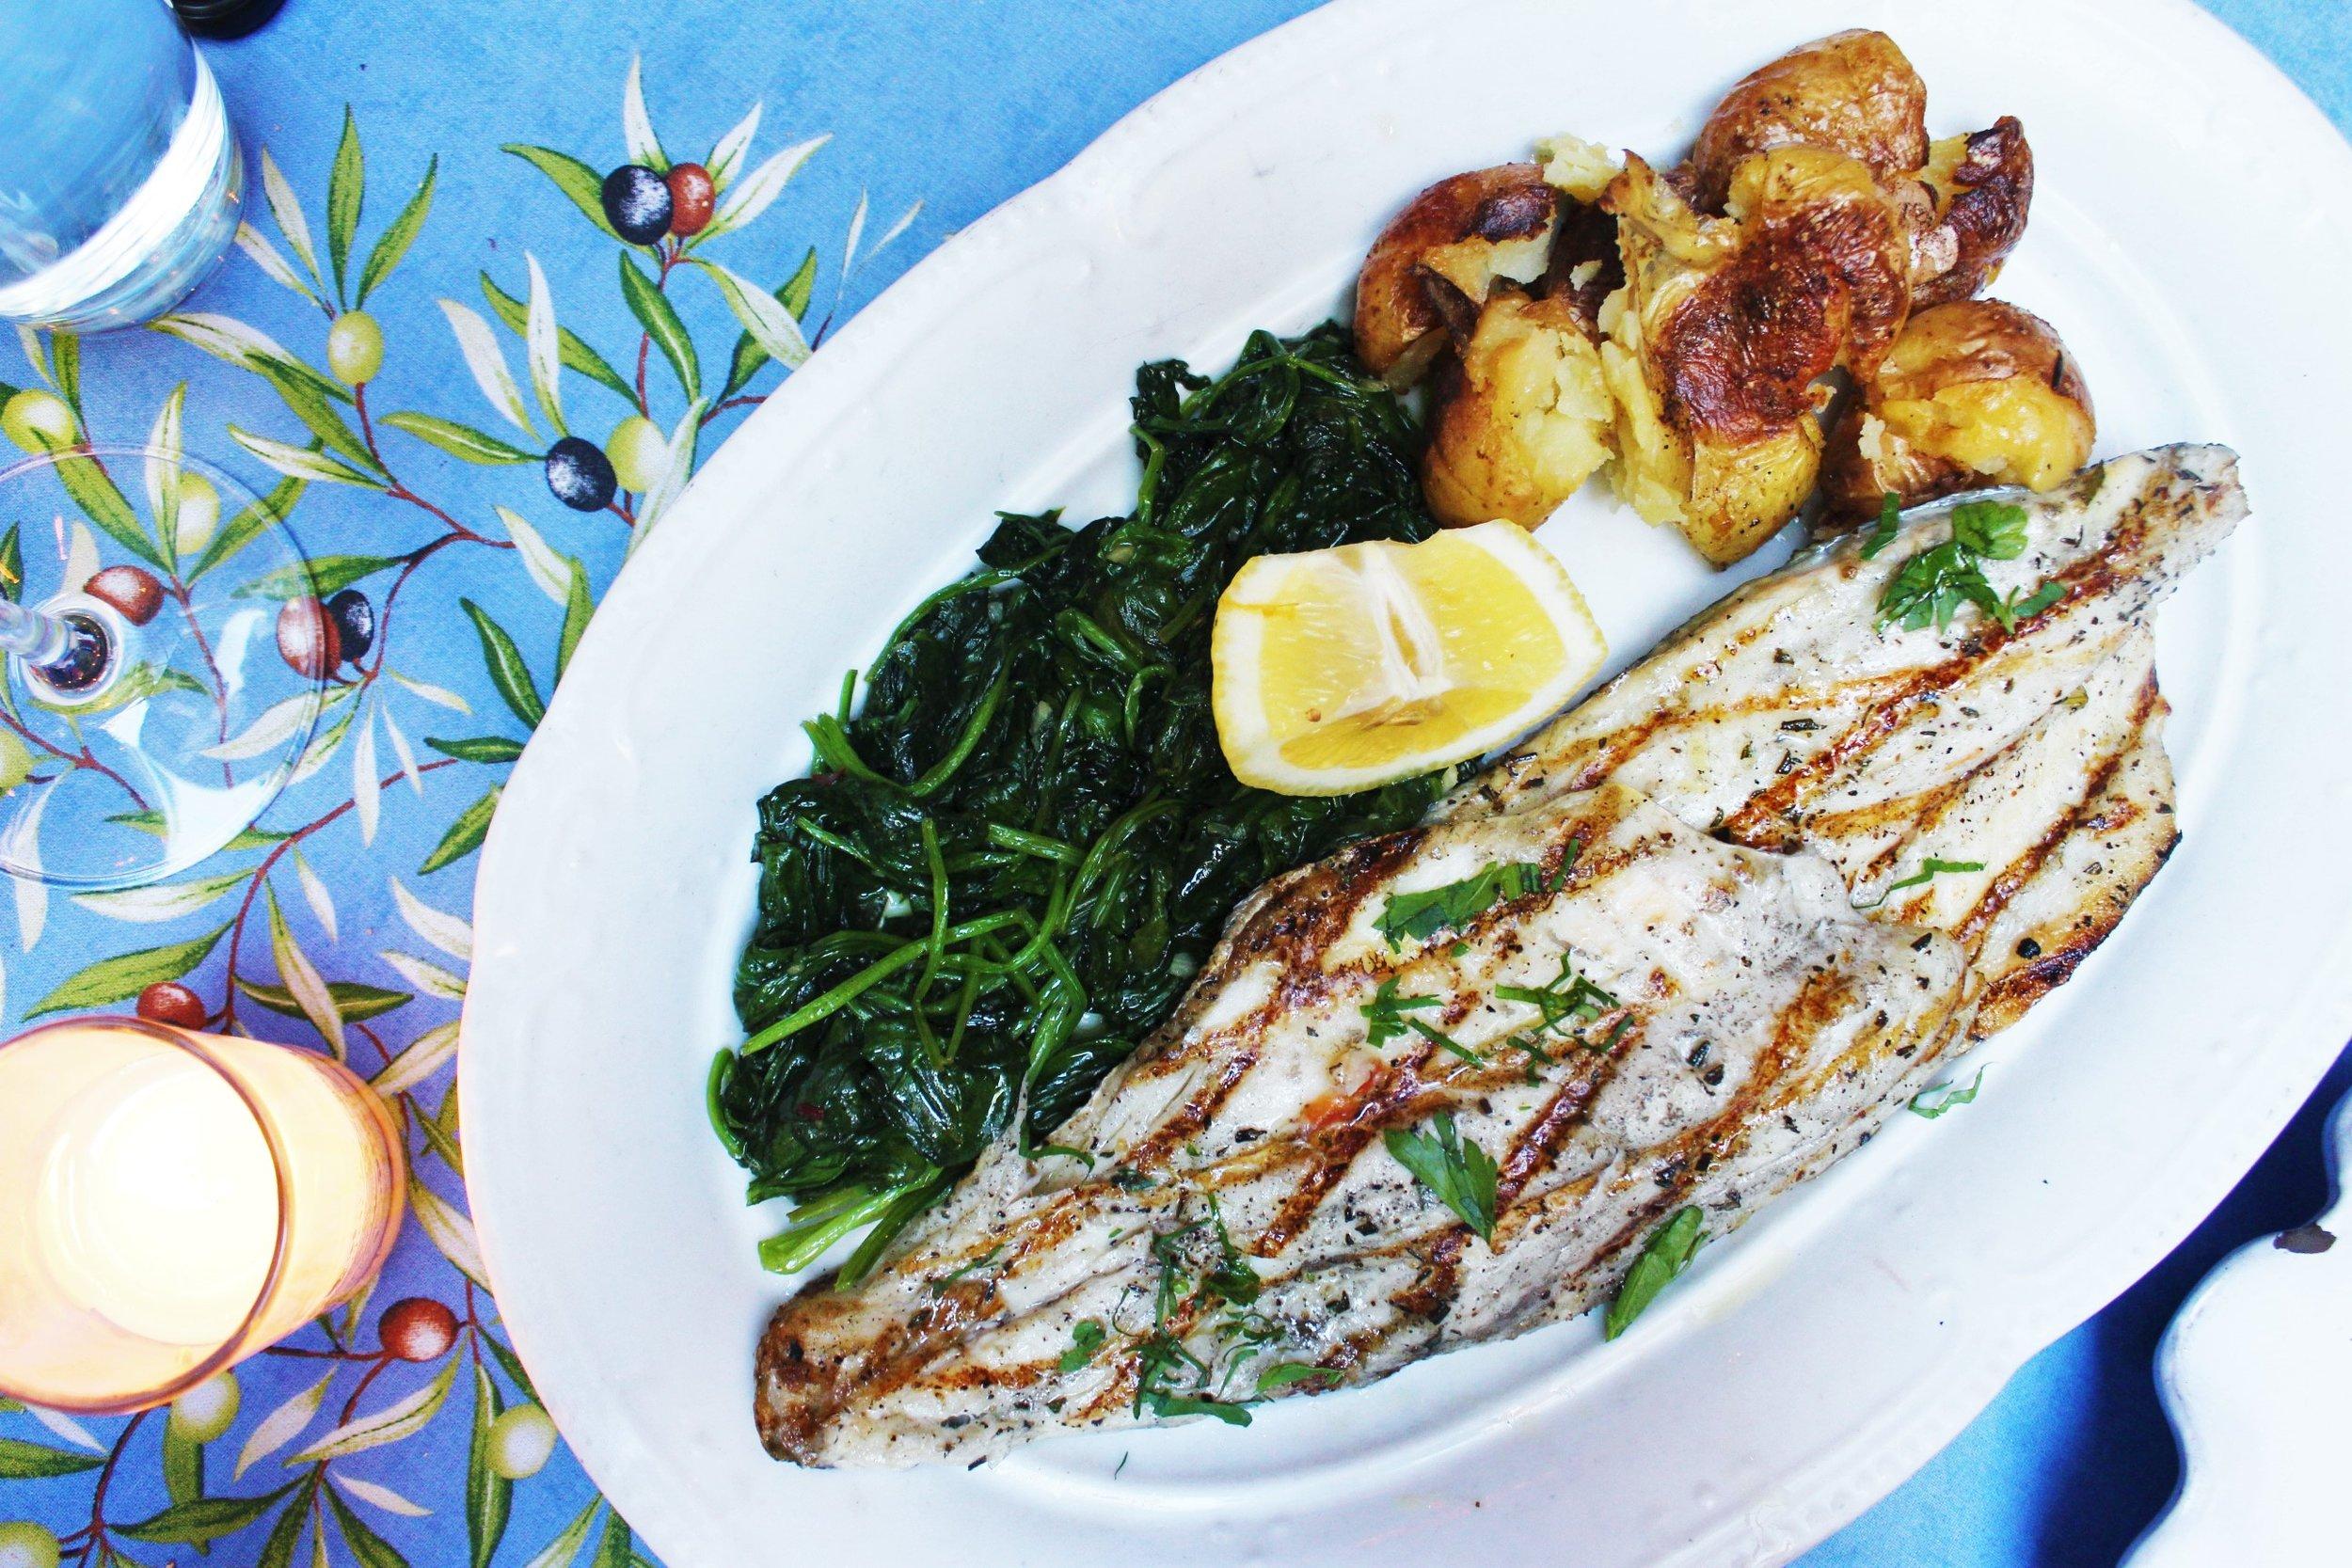 Branzino Alla Griglia Grilled Italian Sea Bass With Sautéed Spinach And Herb-Pressed Potatoes